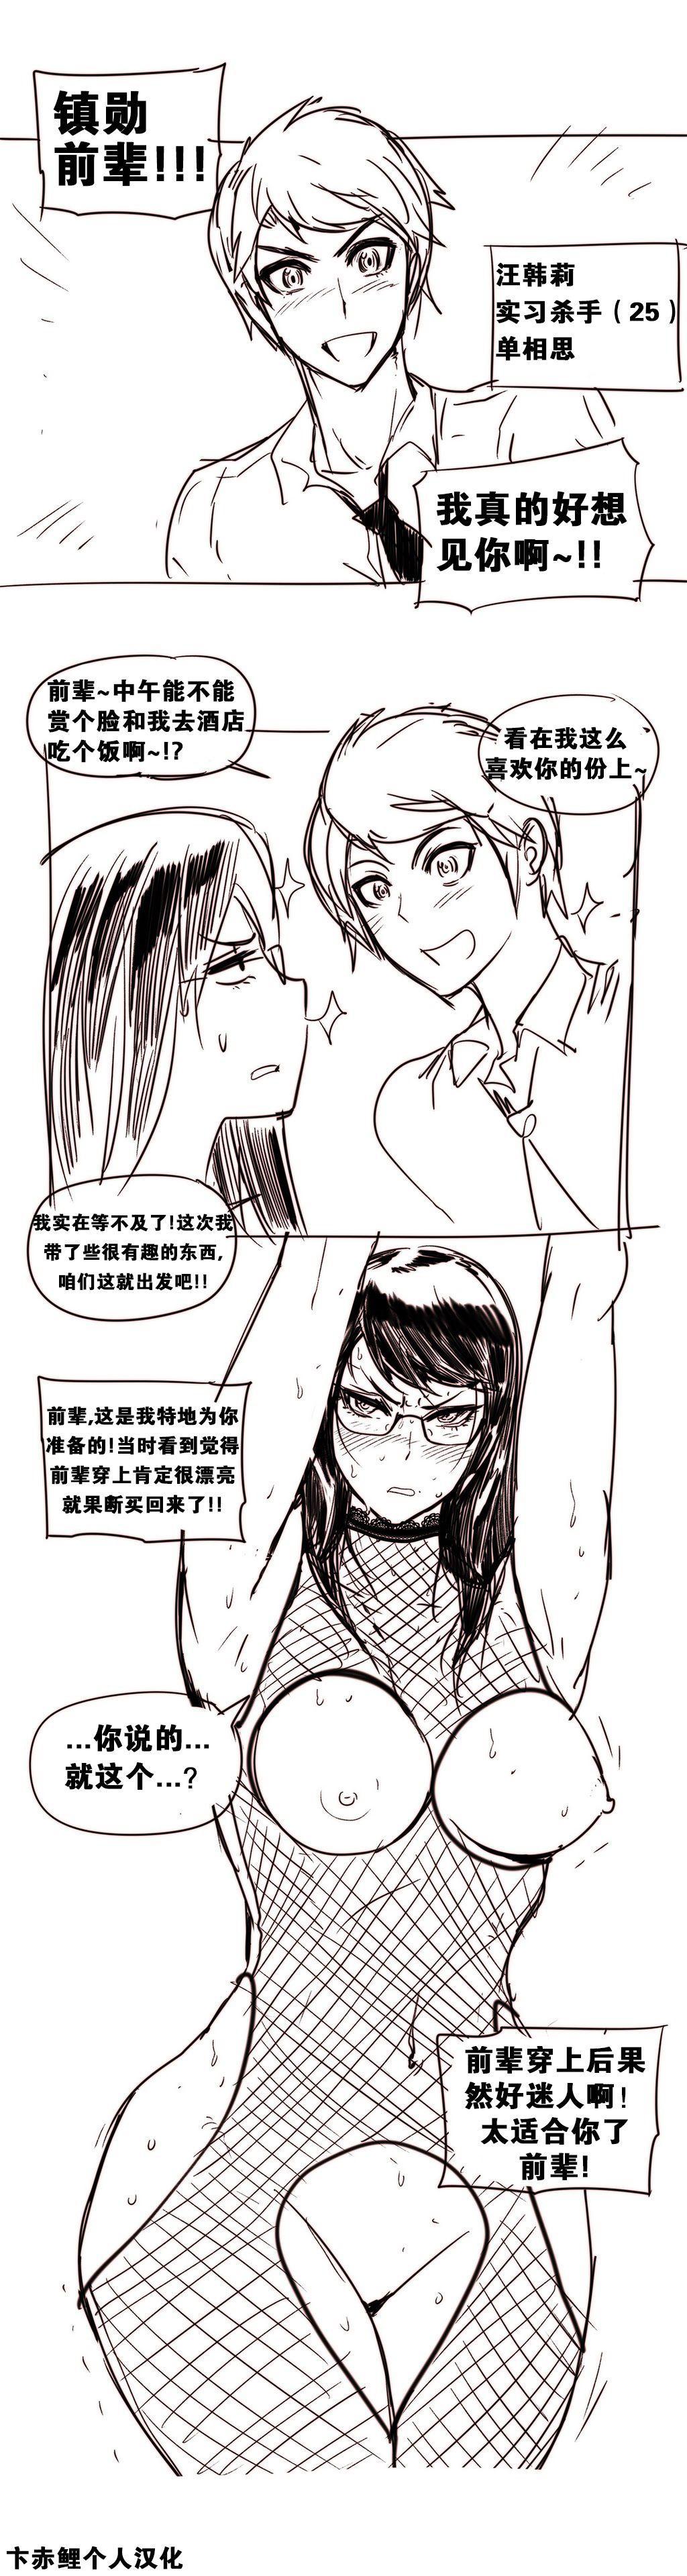 HouseHold Affairs 【卞赤鲤个人汉化】1~33话(持续更新中) 277